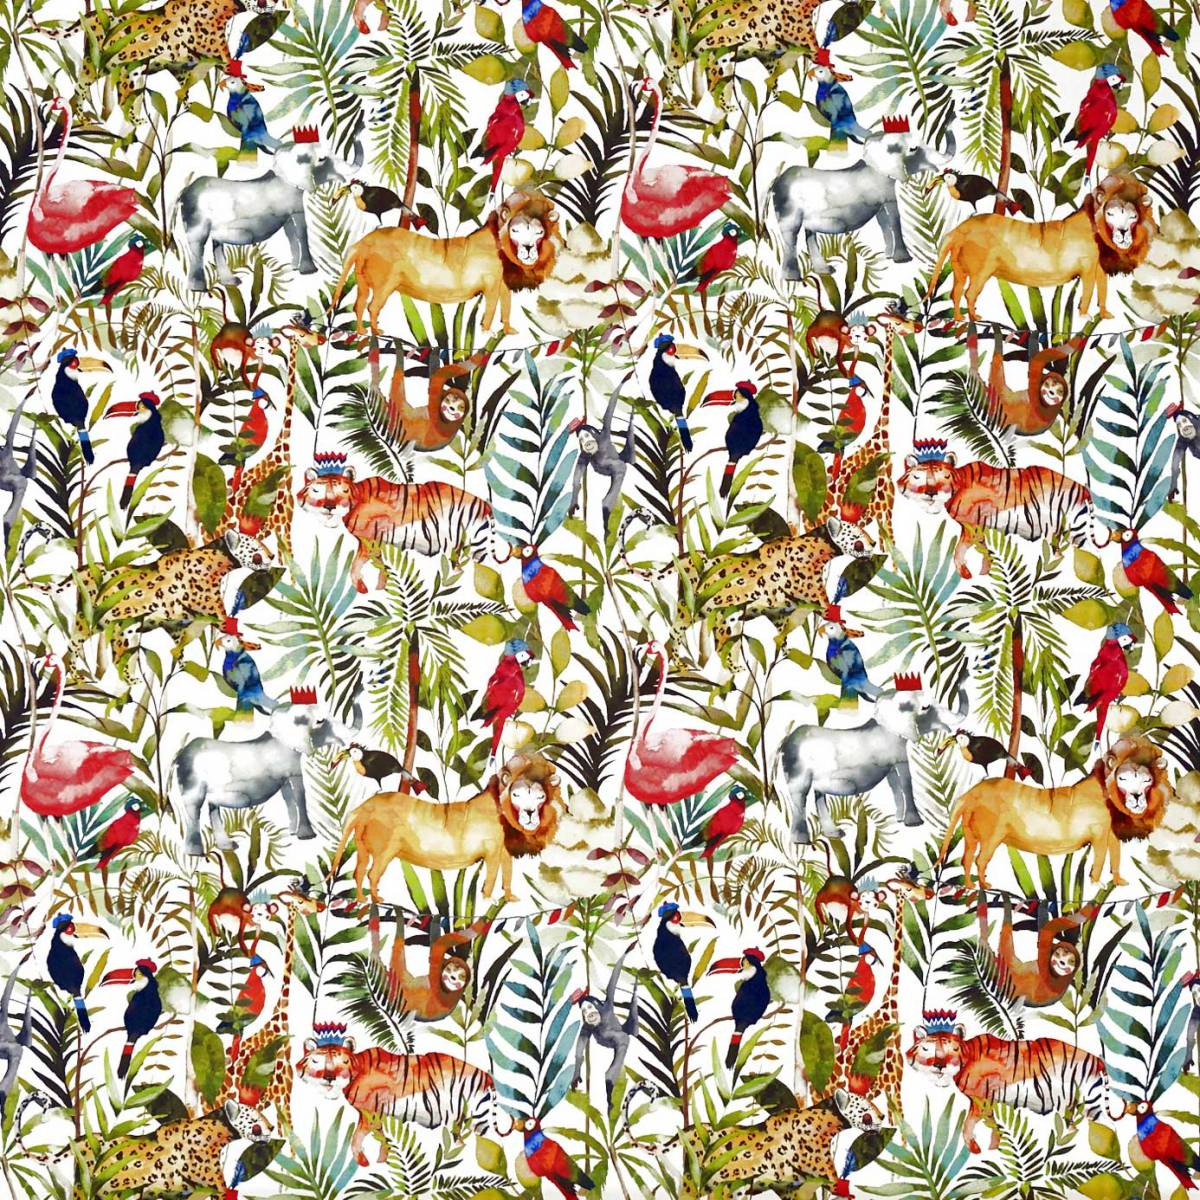 King Of The Jungle Fabric Safari 8630 677